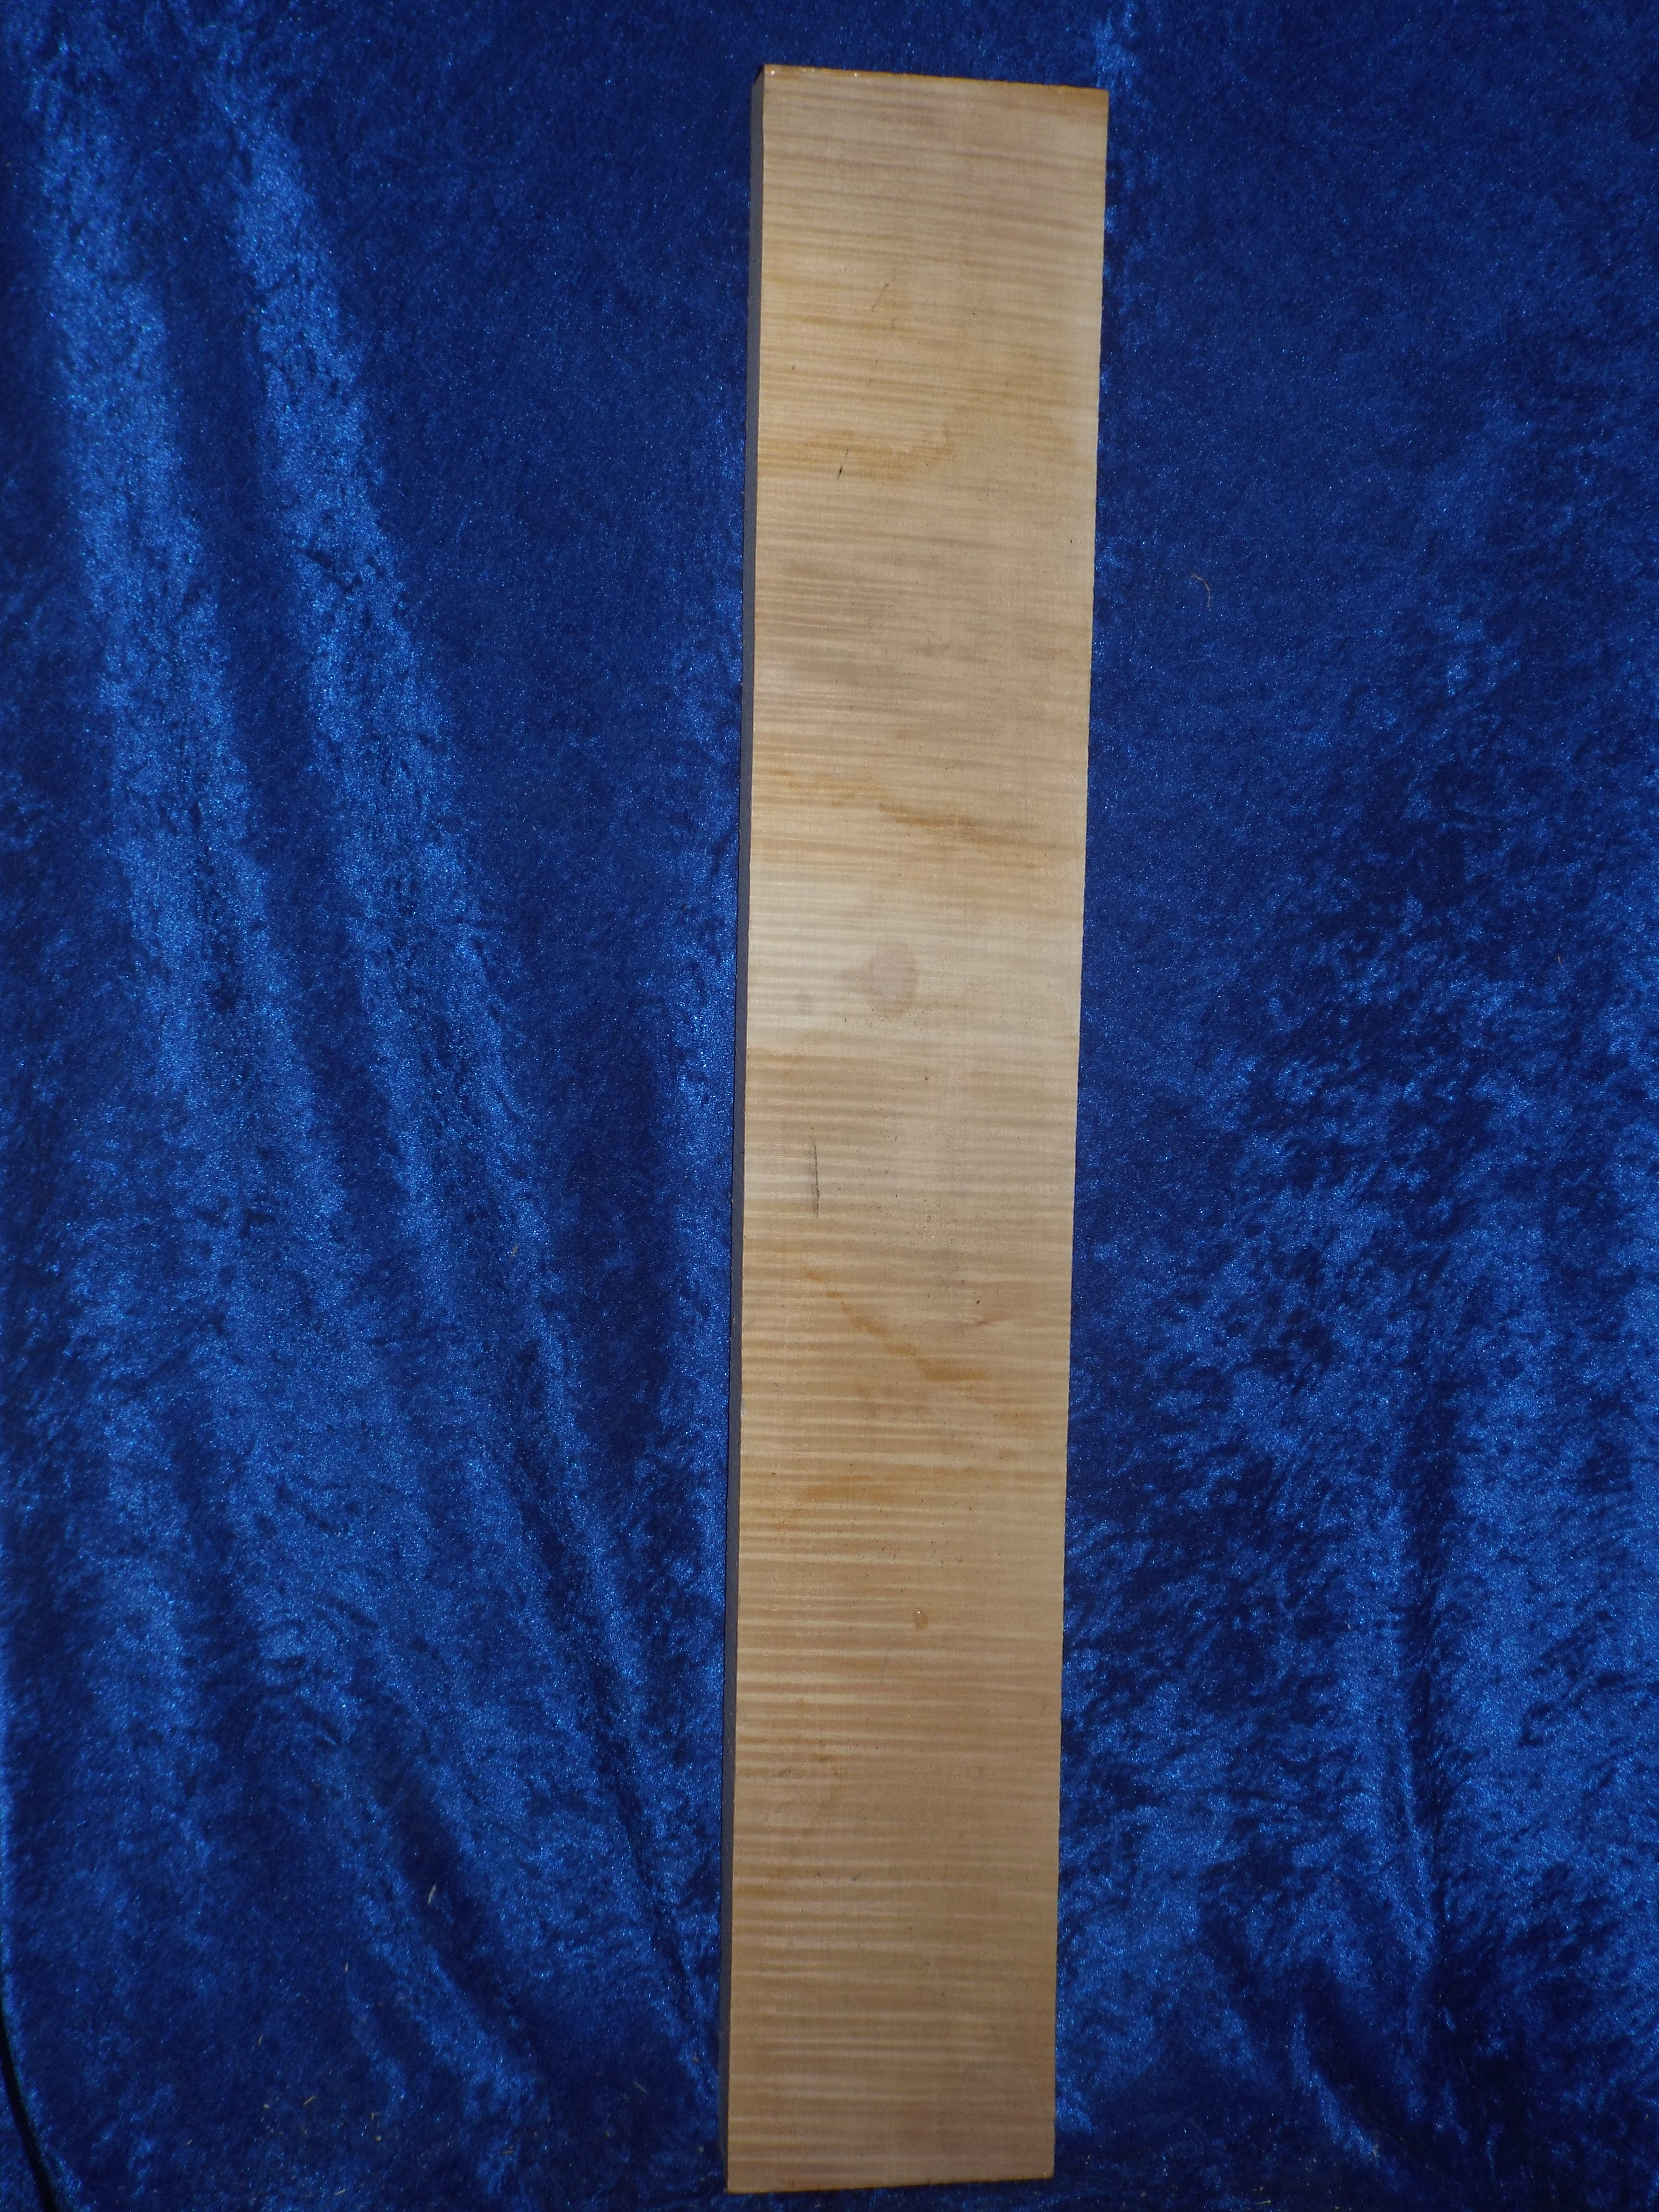 Érable Bloc-chambranles Tonholz Mable Neck tonewood 1000 x 180 x 45 mm sec B